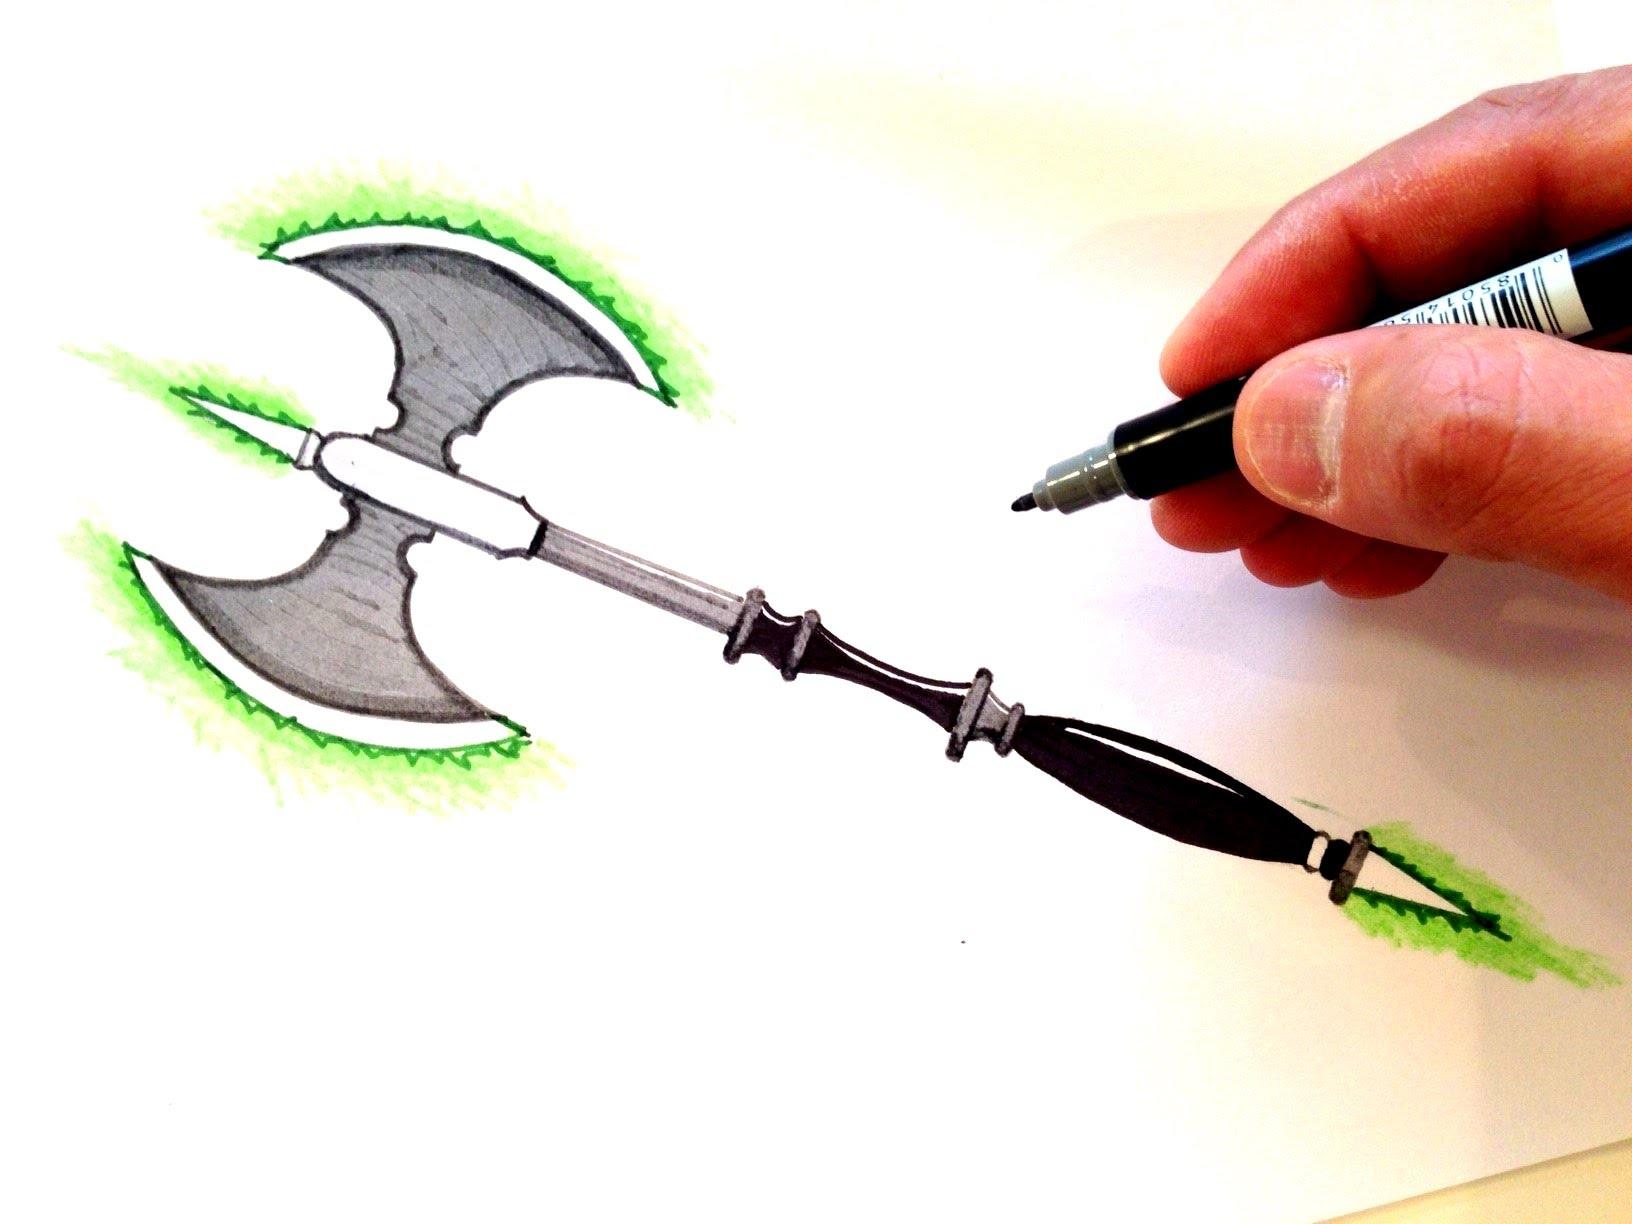 Drawn shotgun old gun Lightsaber Axe to YouTube How